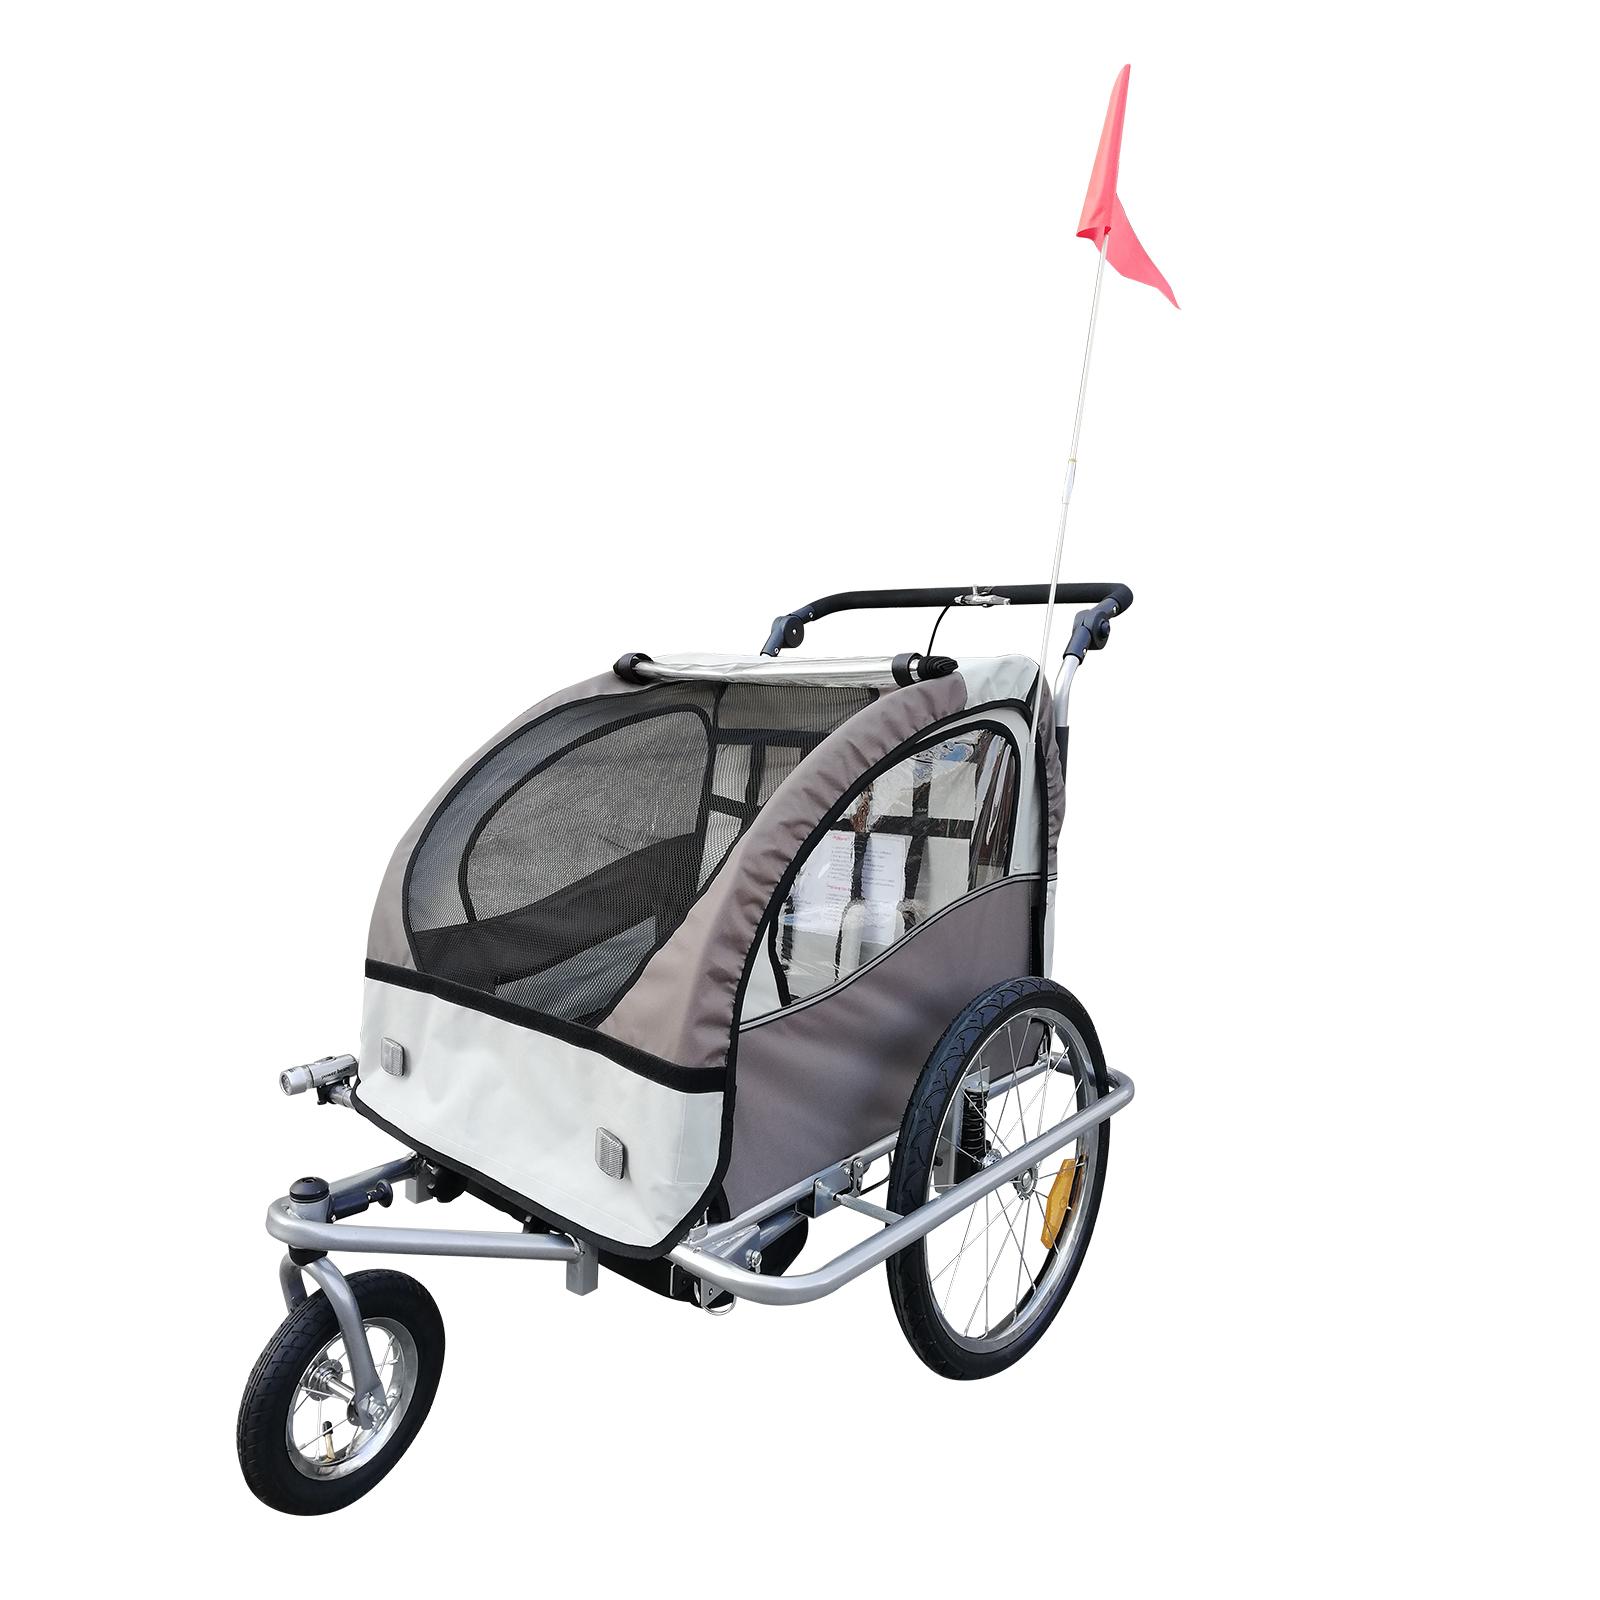 Remolque-Infantil-Bicicleta-2-PLAZAS-Kit-Footing-Rueda-360-Amortiguadores-Barra miniatura 24